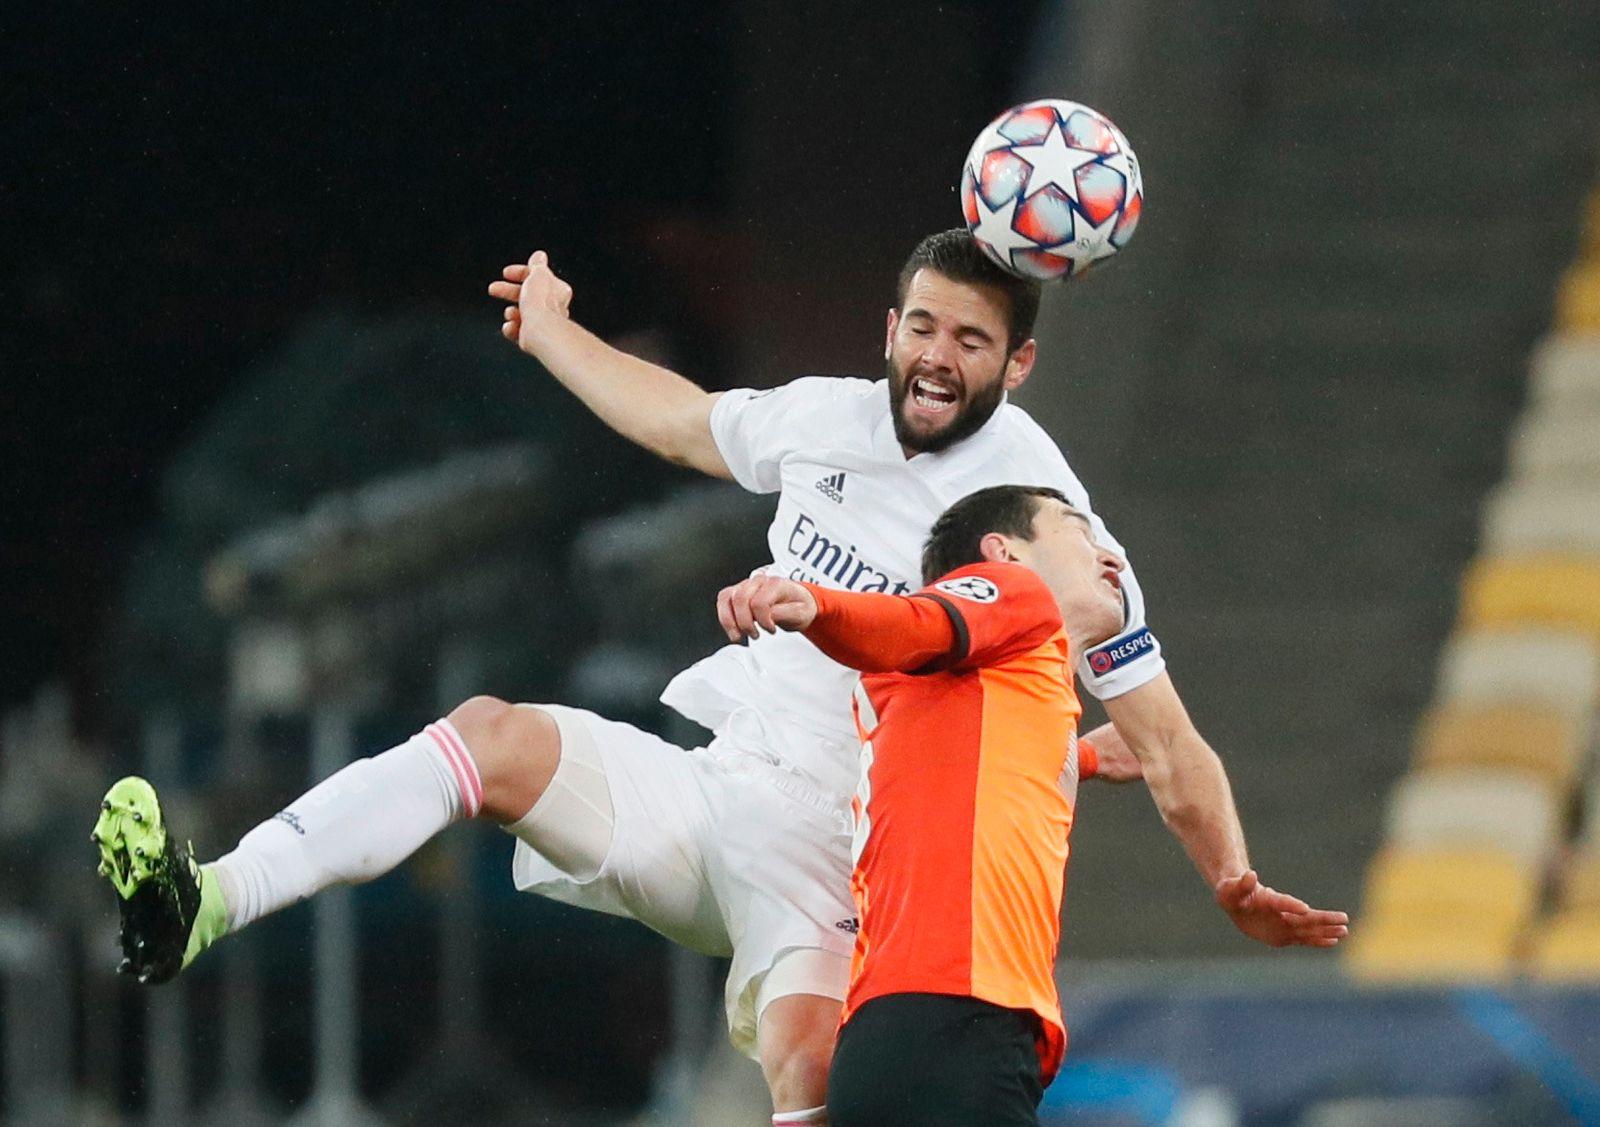 Champions League - Group B - Shakhtar Donetsk v Real Madrid